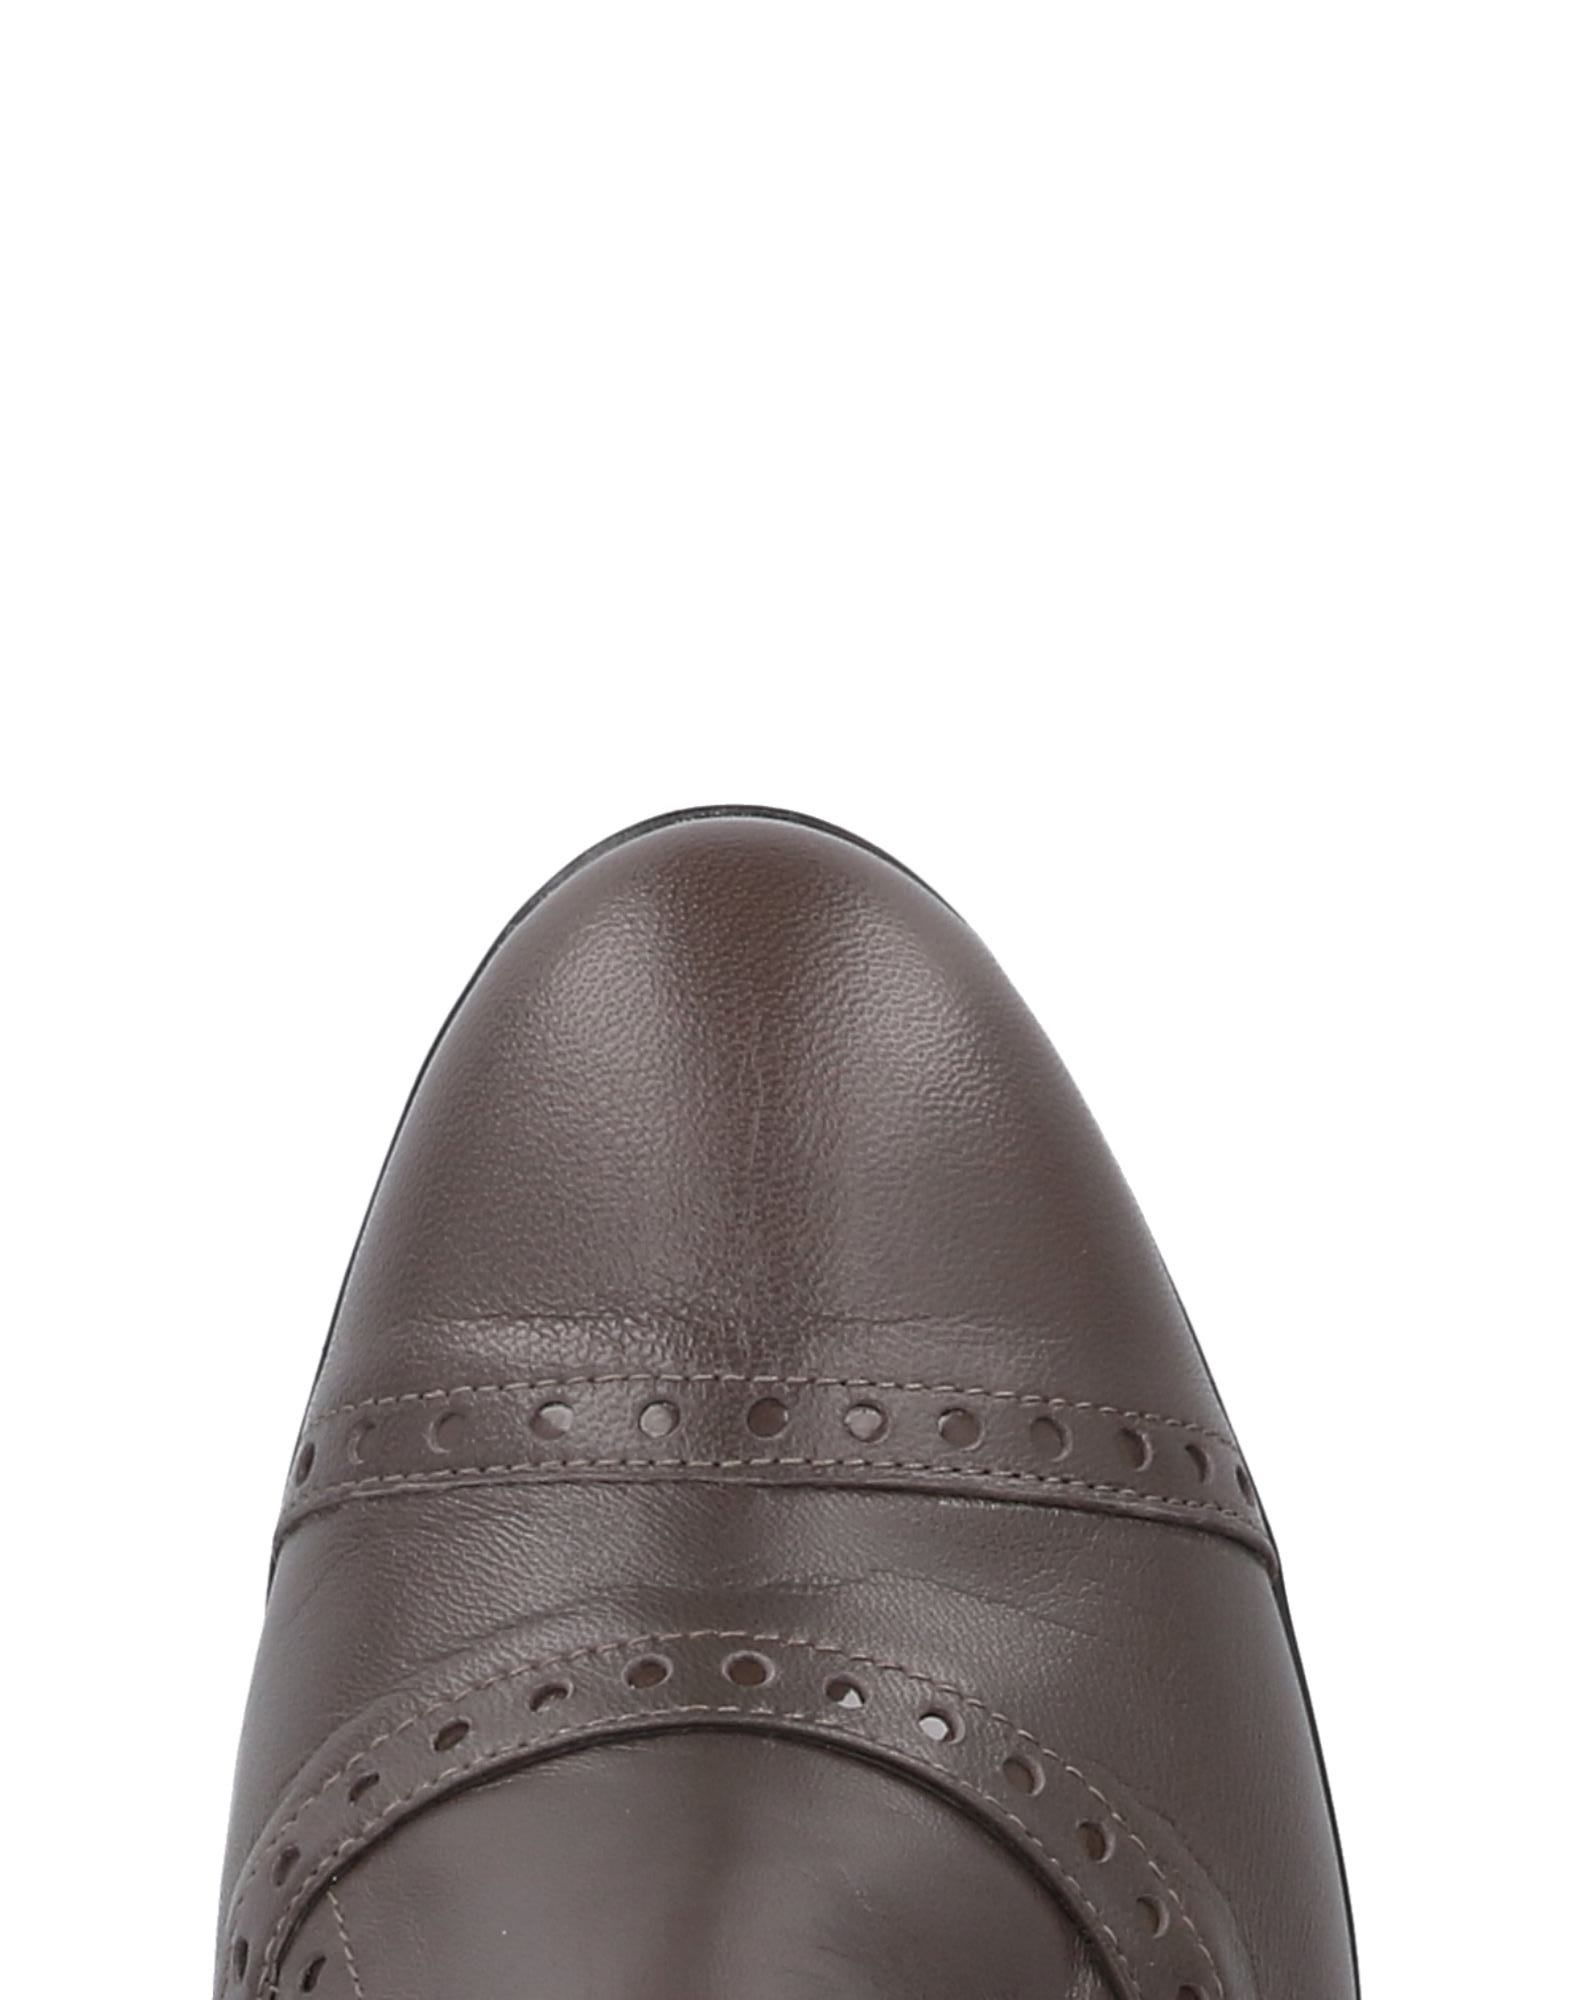 Alessia Guidi Mokassins Damen  Schuhe 11466798JC Gute Qualität beliebte Schuhe  d3988c